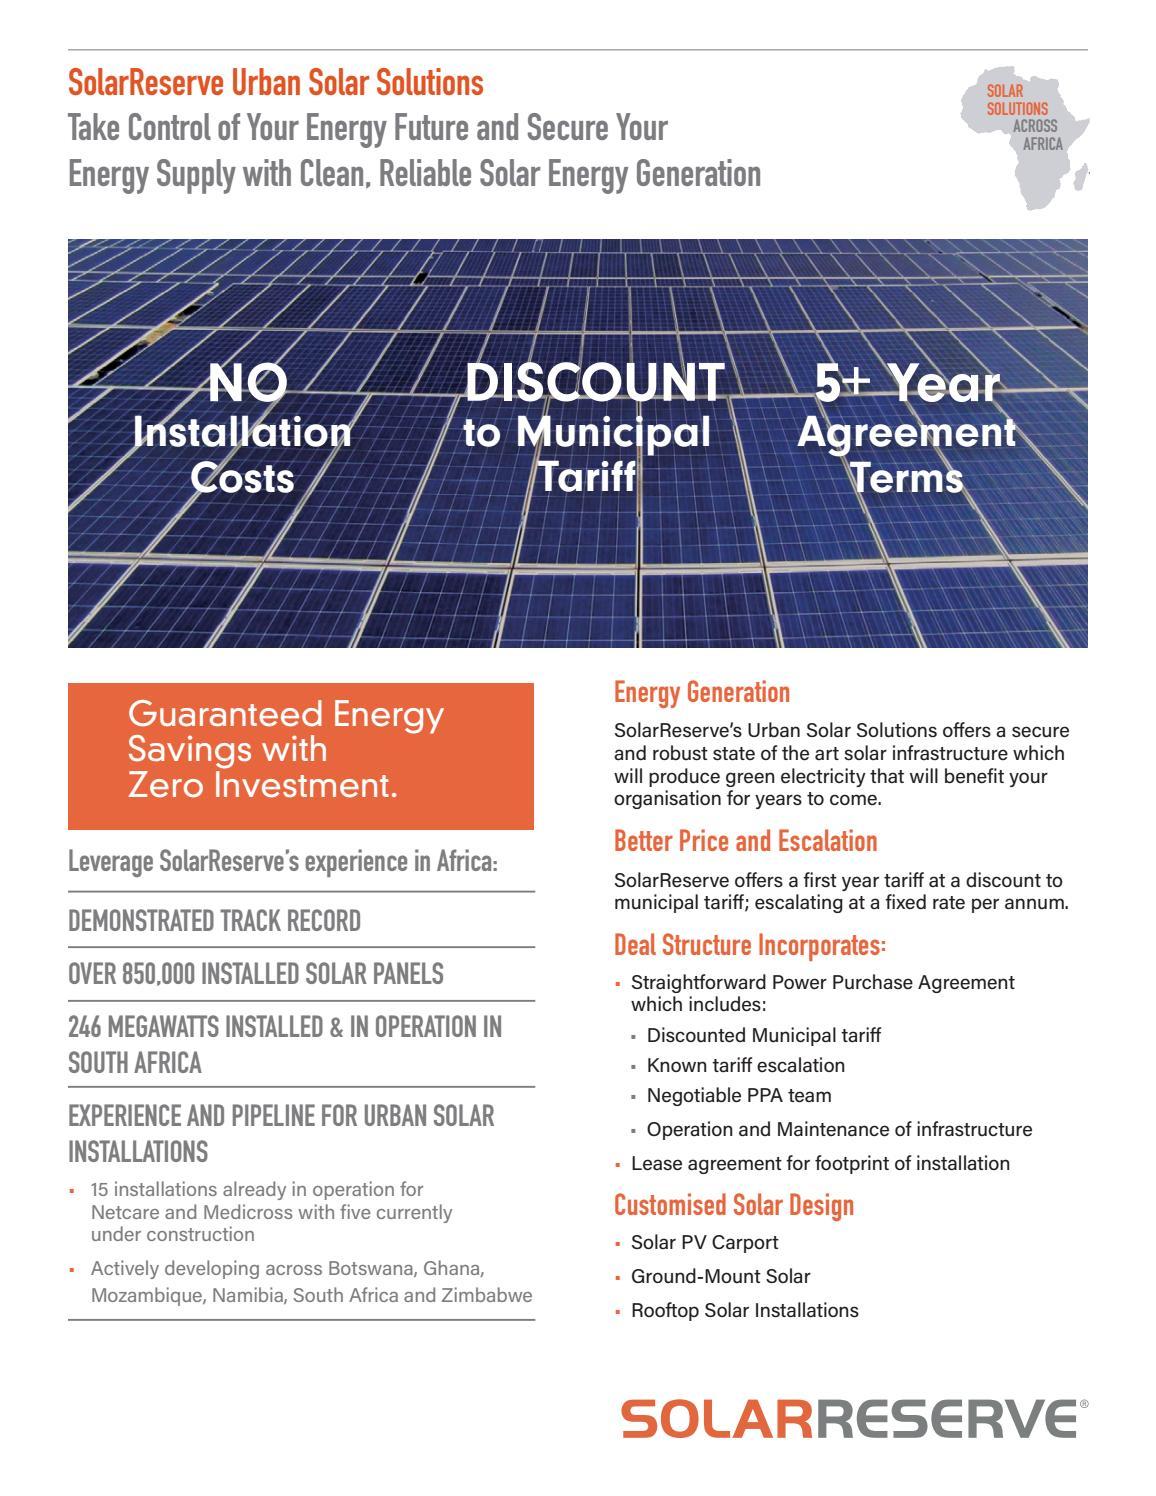 Solarreserve Urban Solar Solutions By Solarreserve Issuu